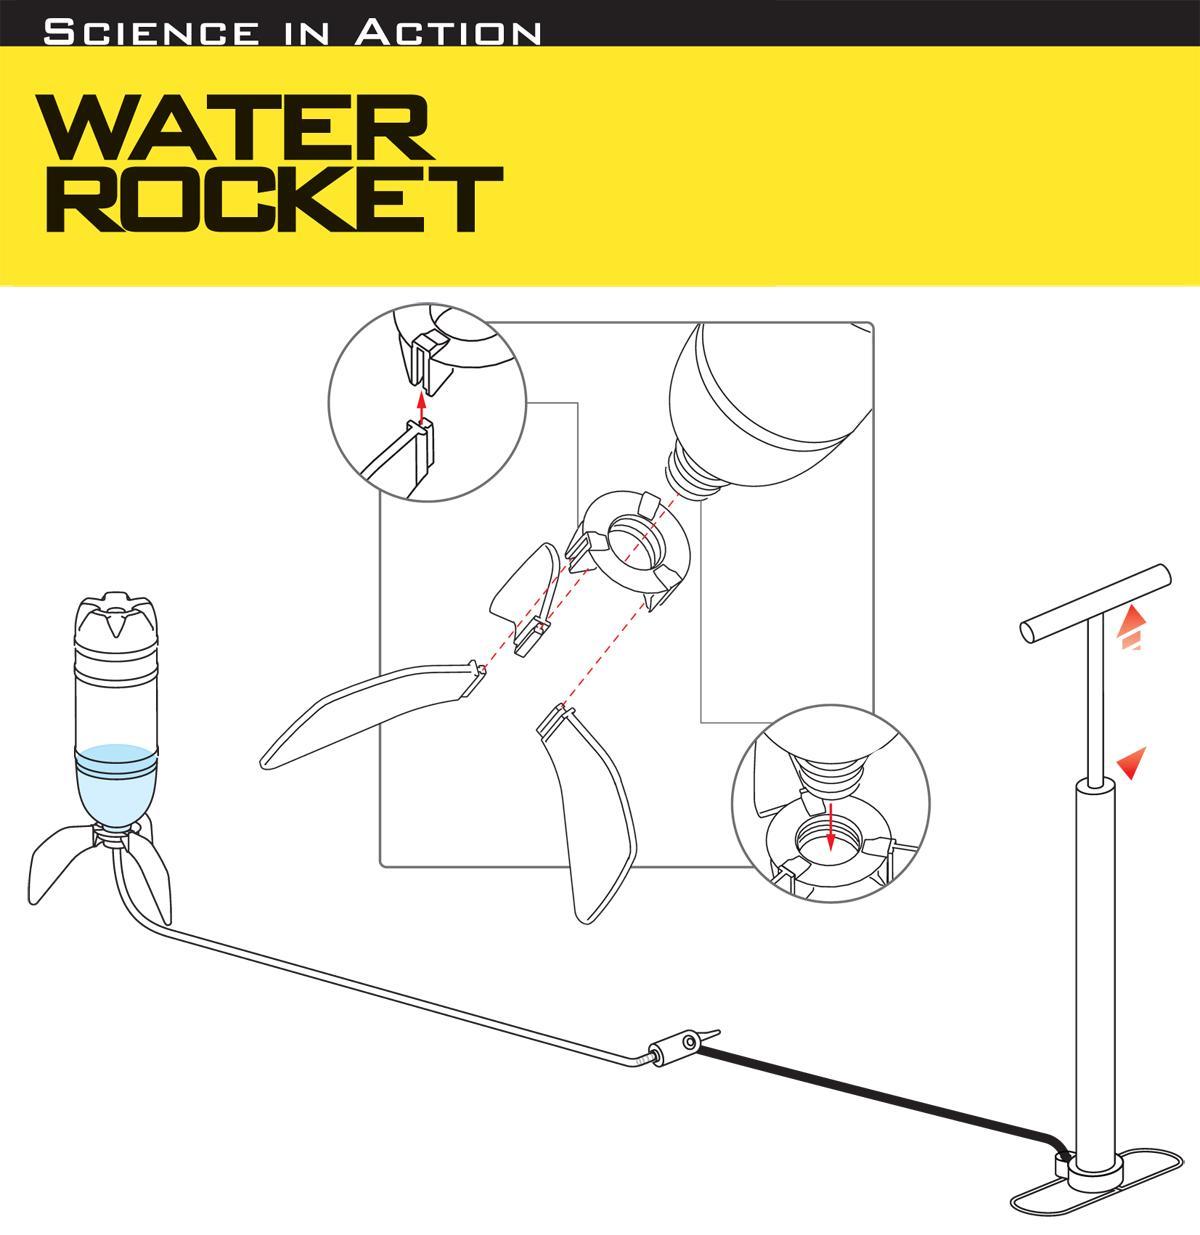 Water Bottle Rocket Design Plans: Amazon.com: 4M Water Rocket Kit: Toys & Games